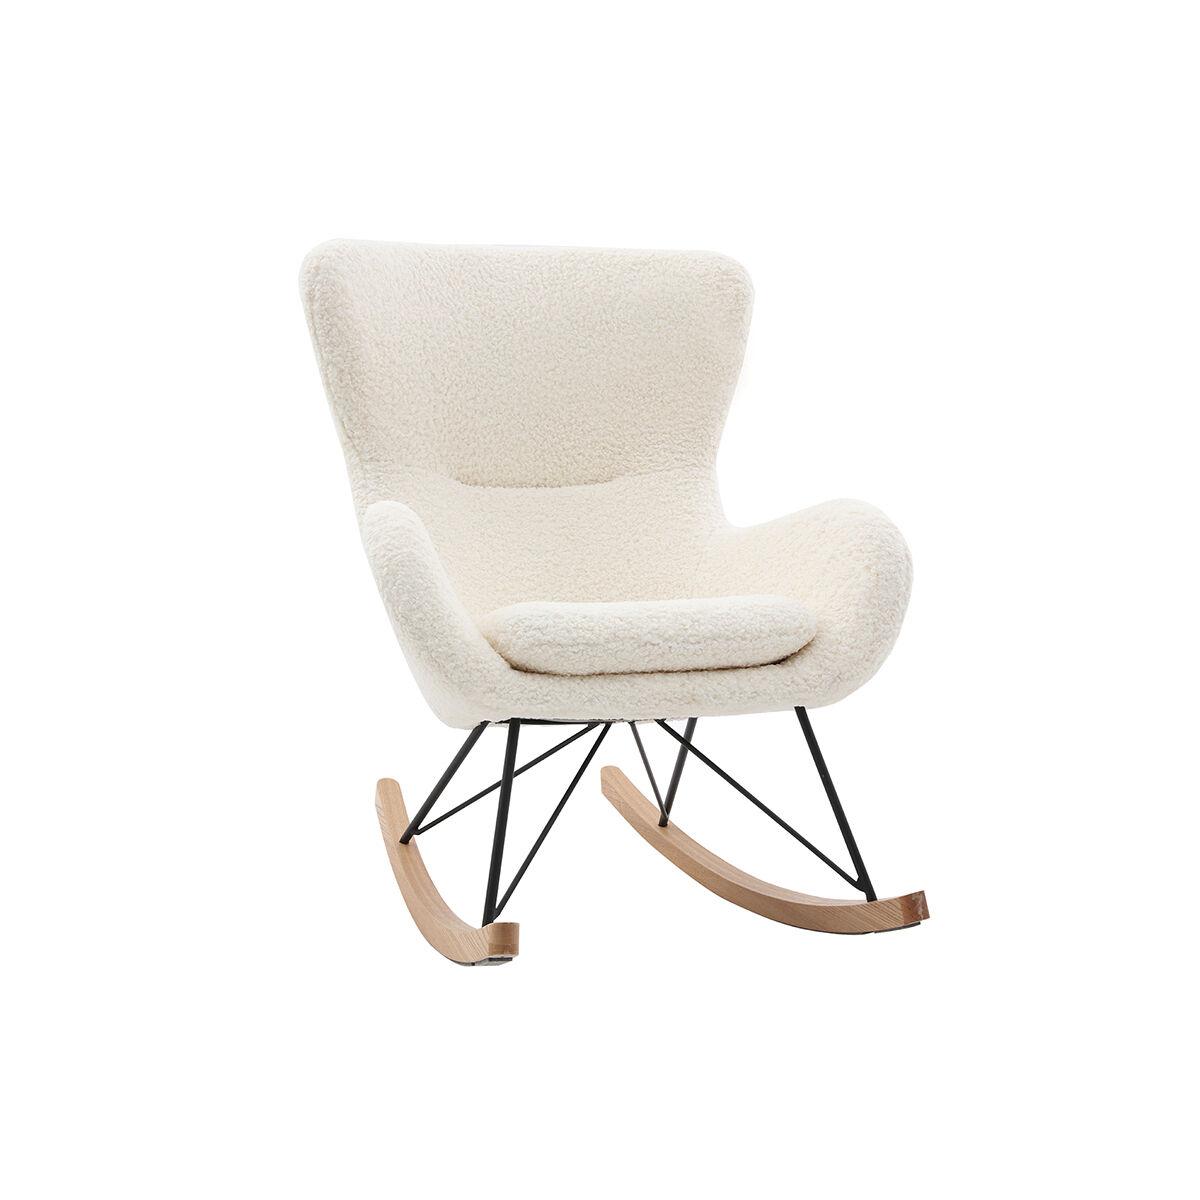 Miliboo Rocking chair design tissu blanc effet peau de mouton ESKUA